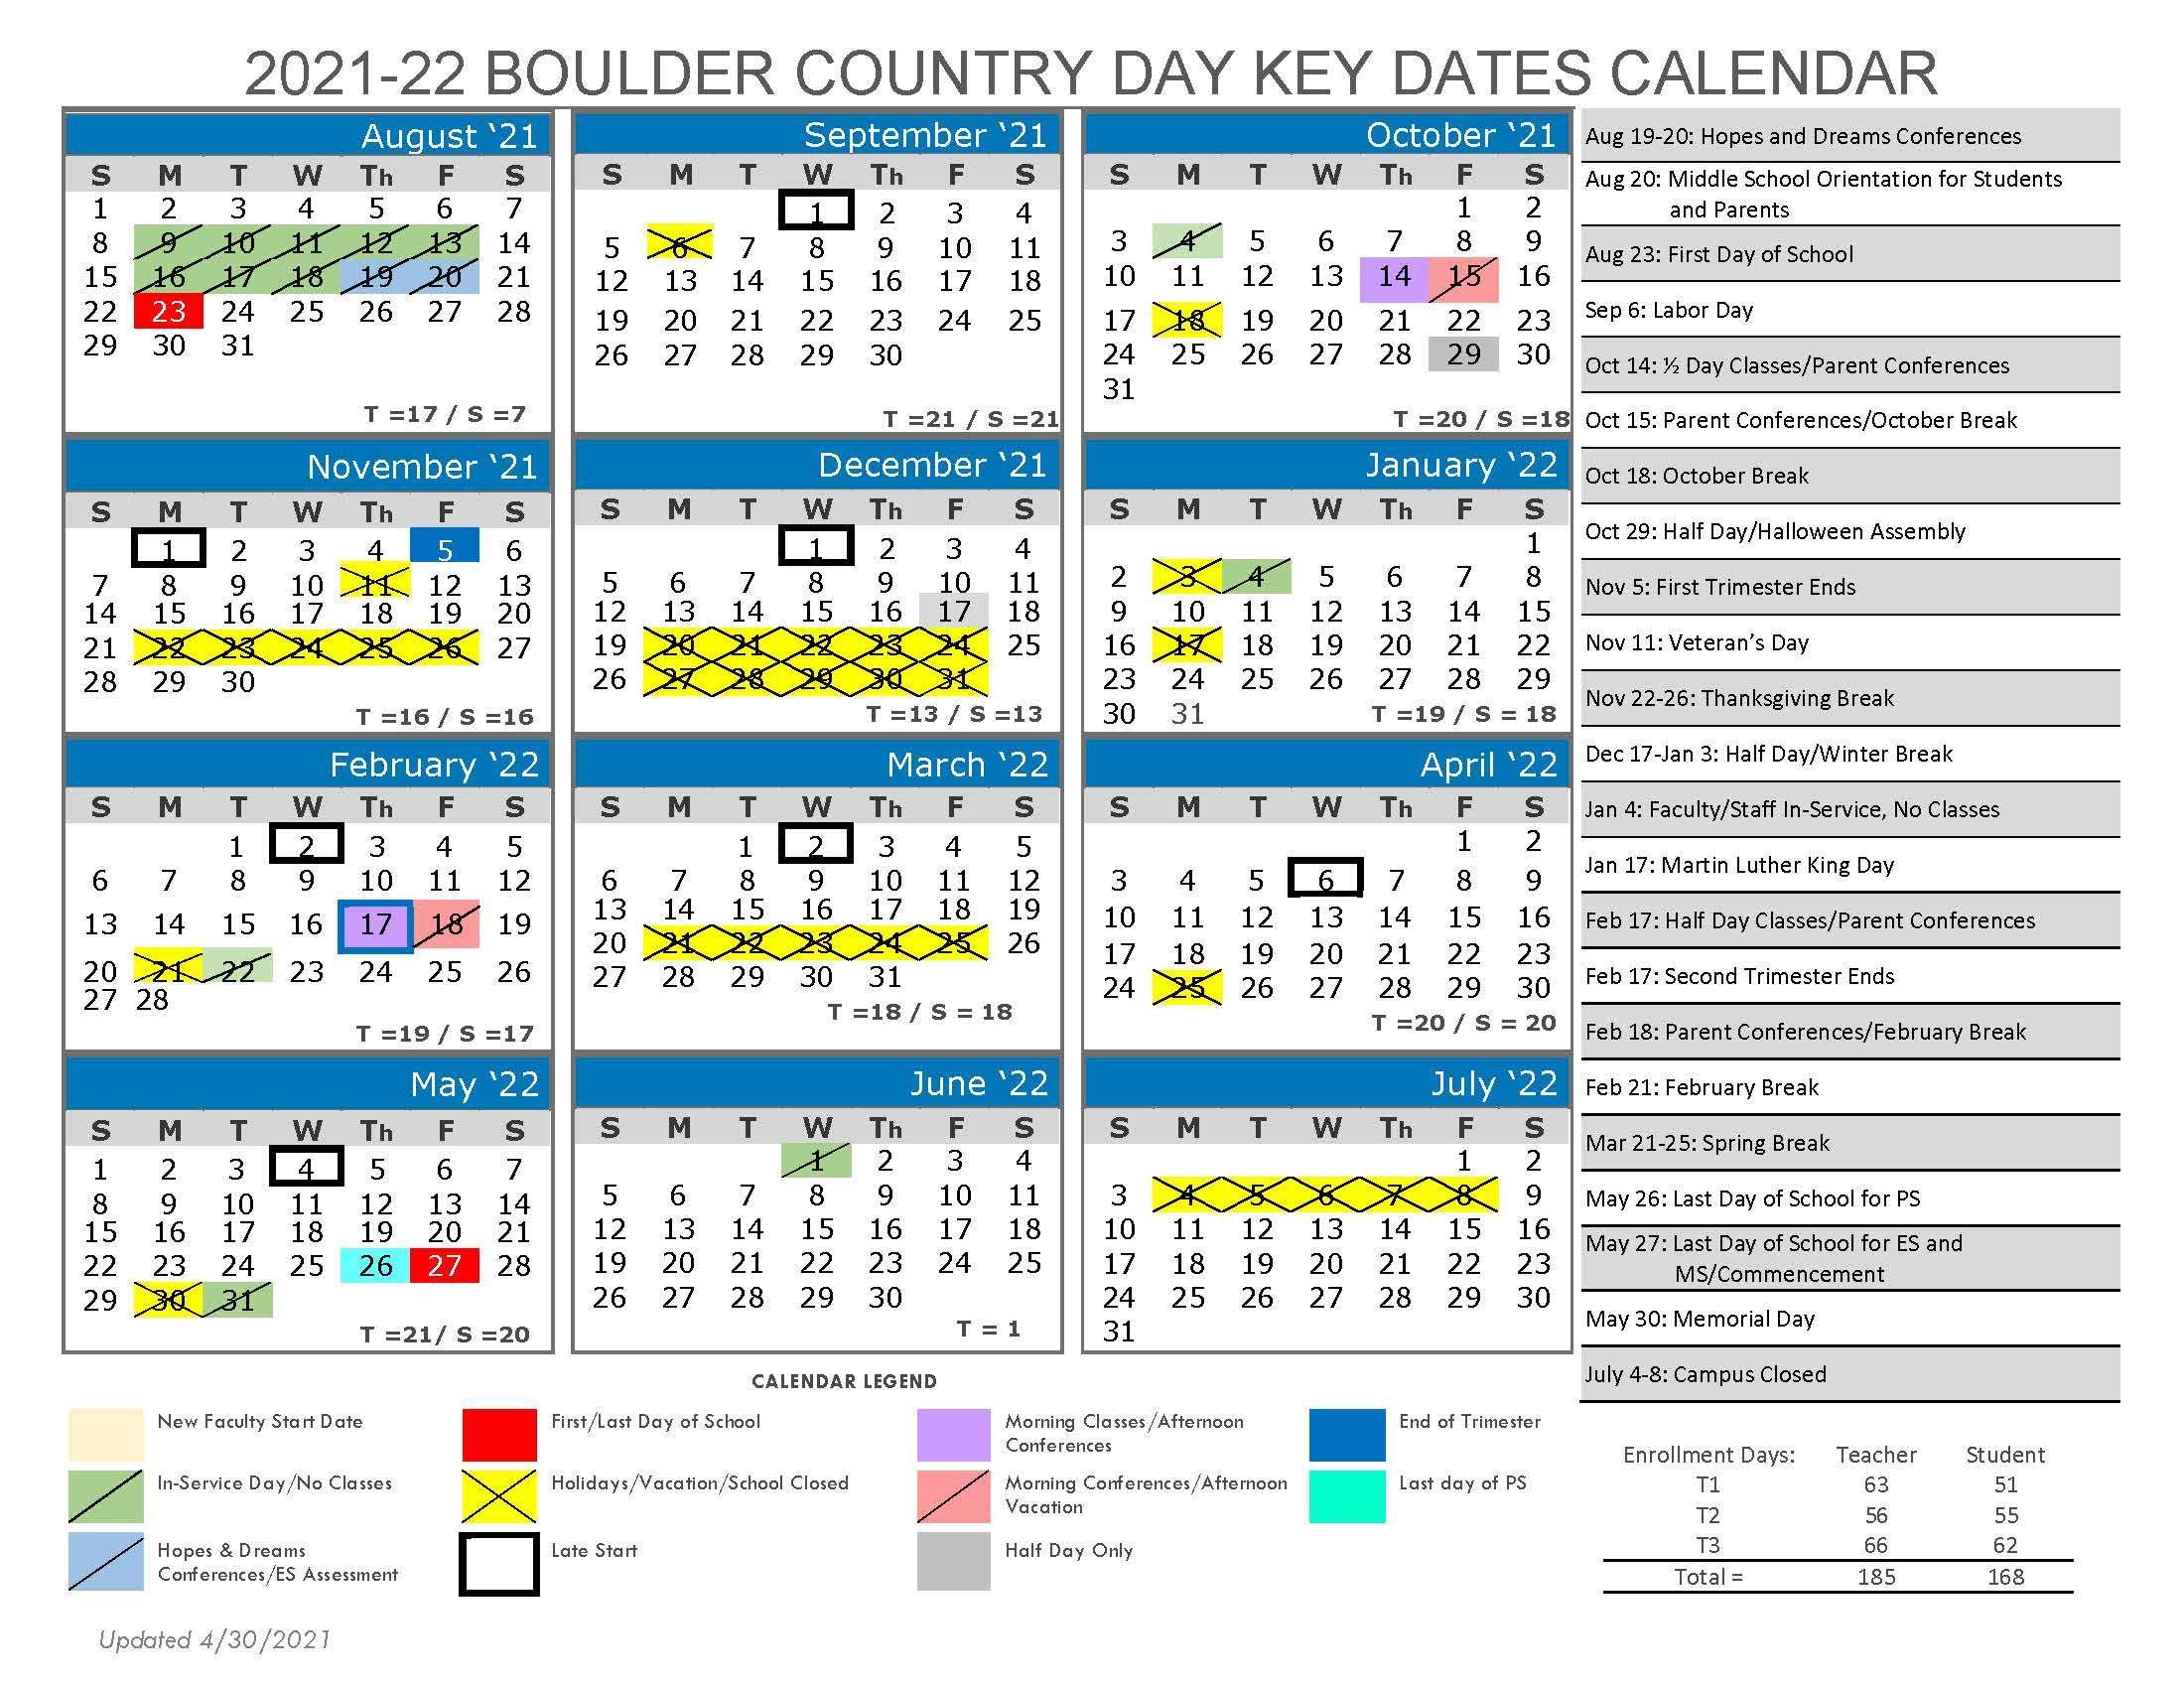 Cu Boulder Academic Calendar 2022.Boulder Country Day School Calendar